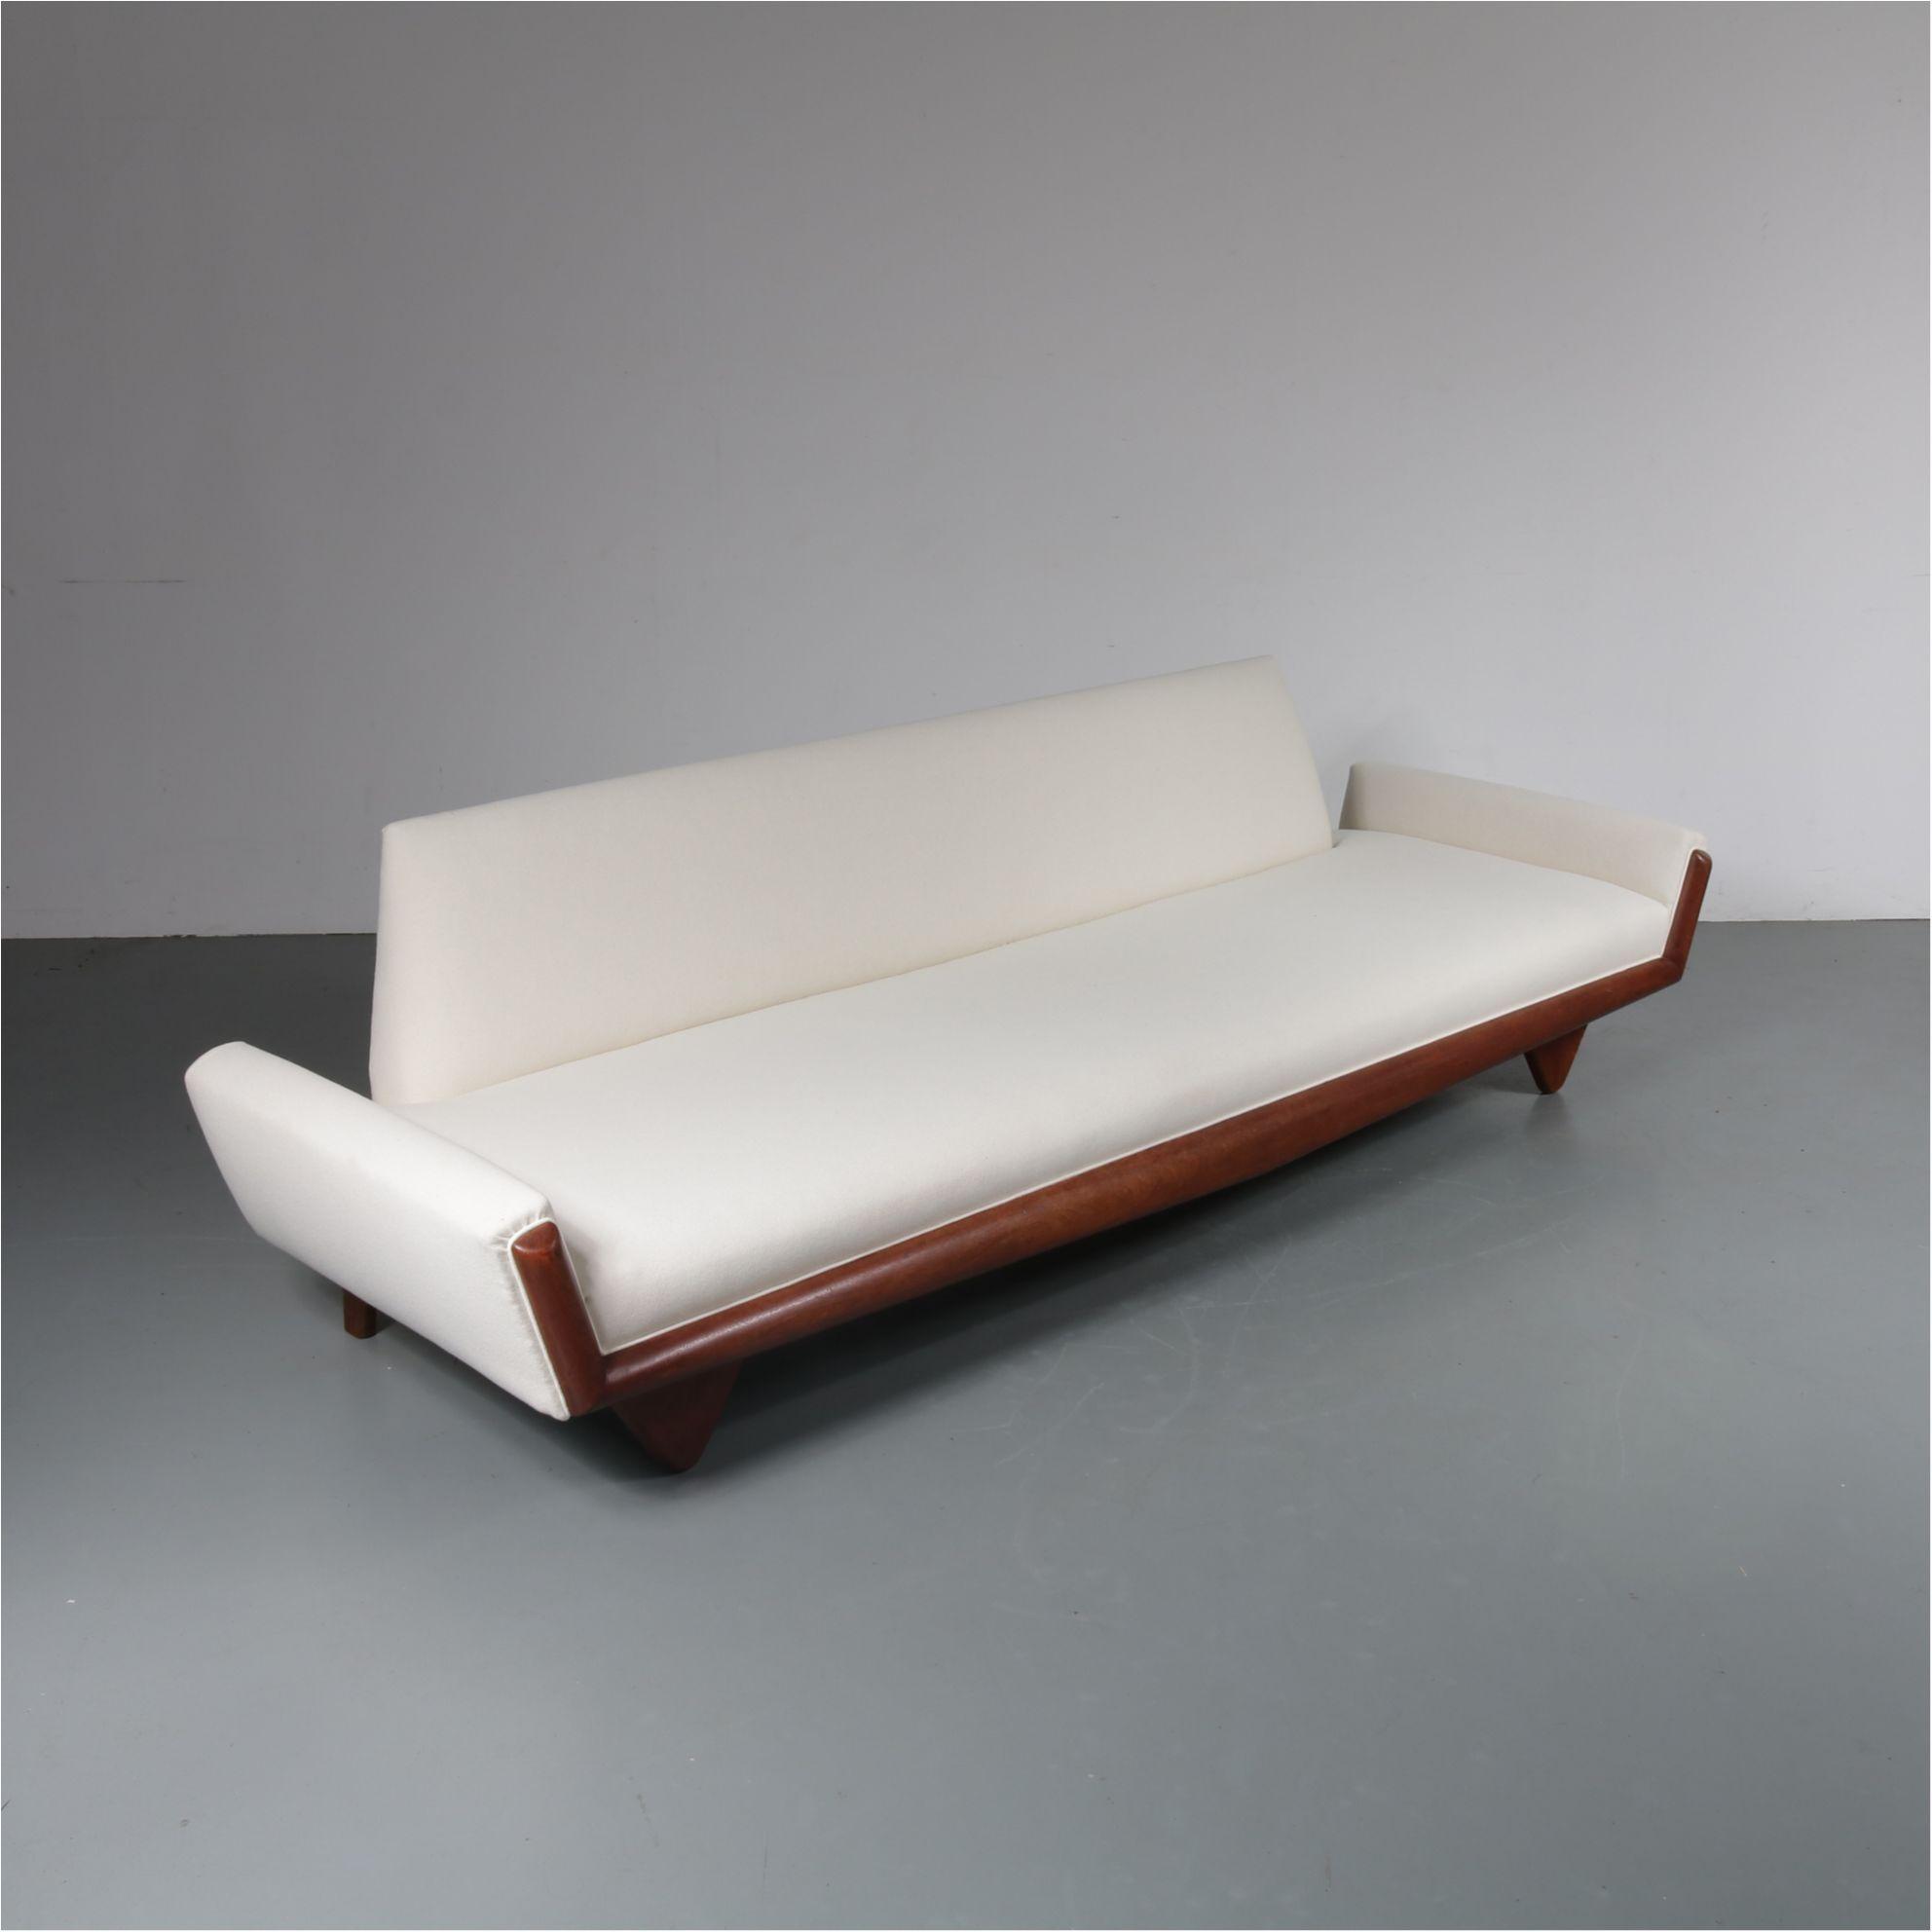 Amazing Adrian Pearsall Gondola Sofa For Craft Associates Usa 1960S Creativecarmelina Interior Chair Design Creativecarmelinacom